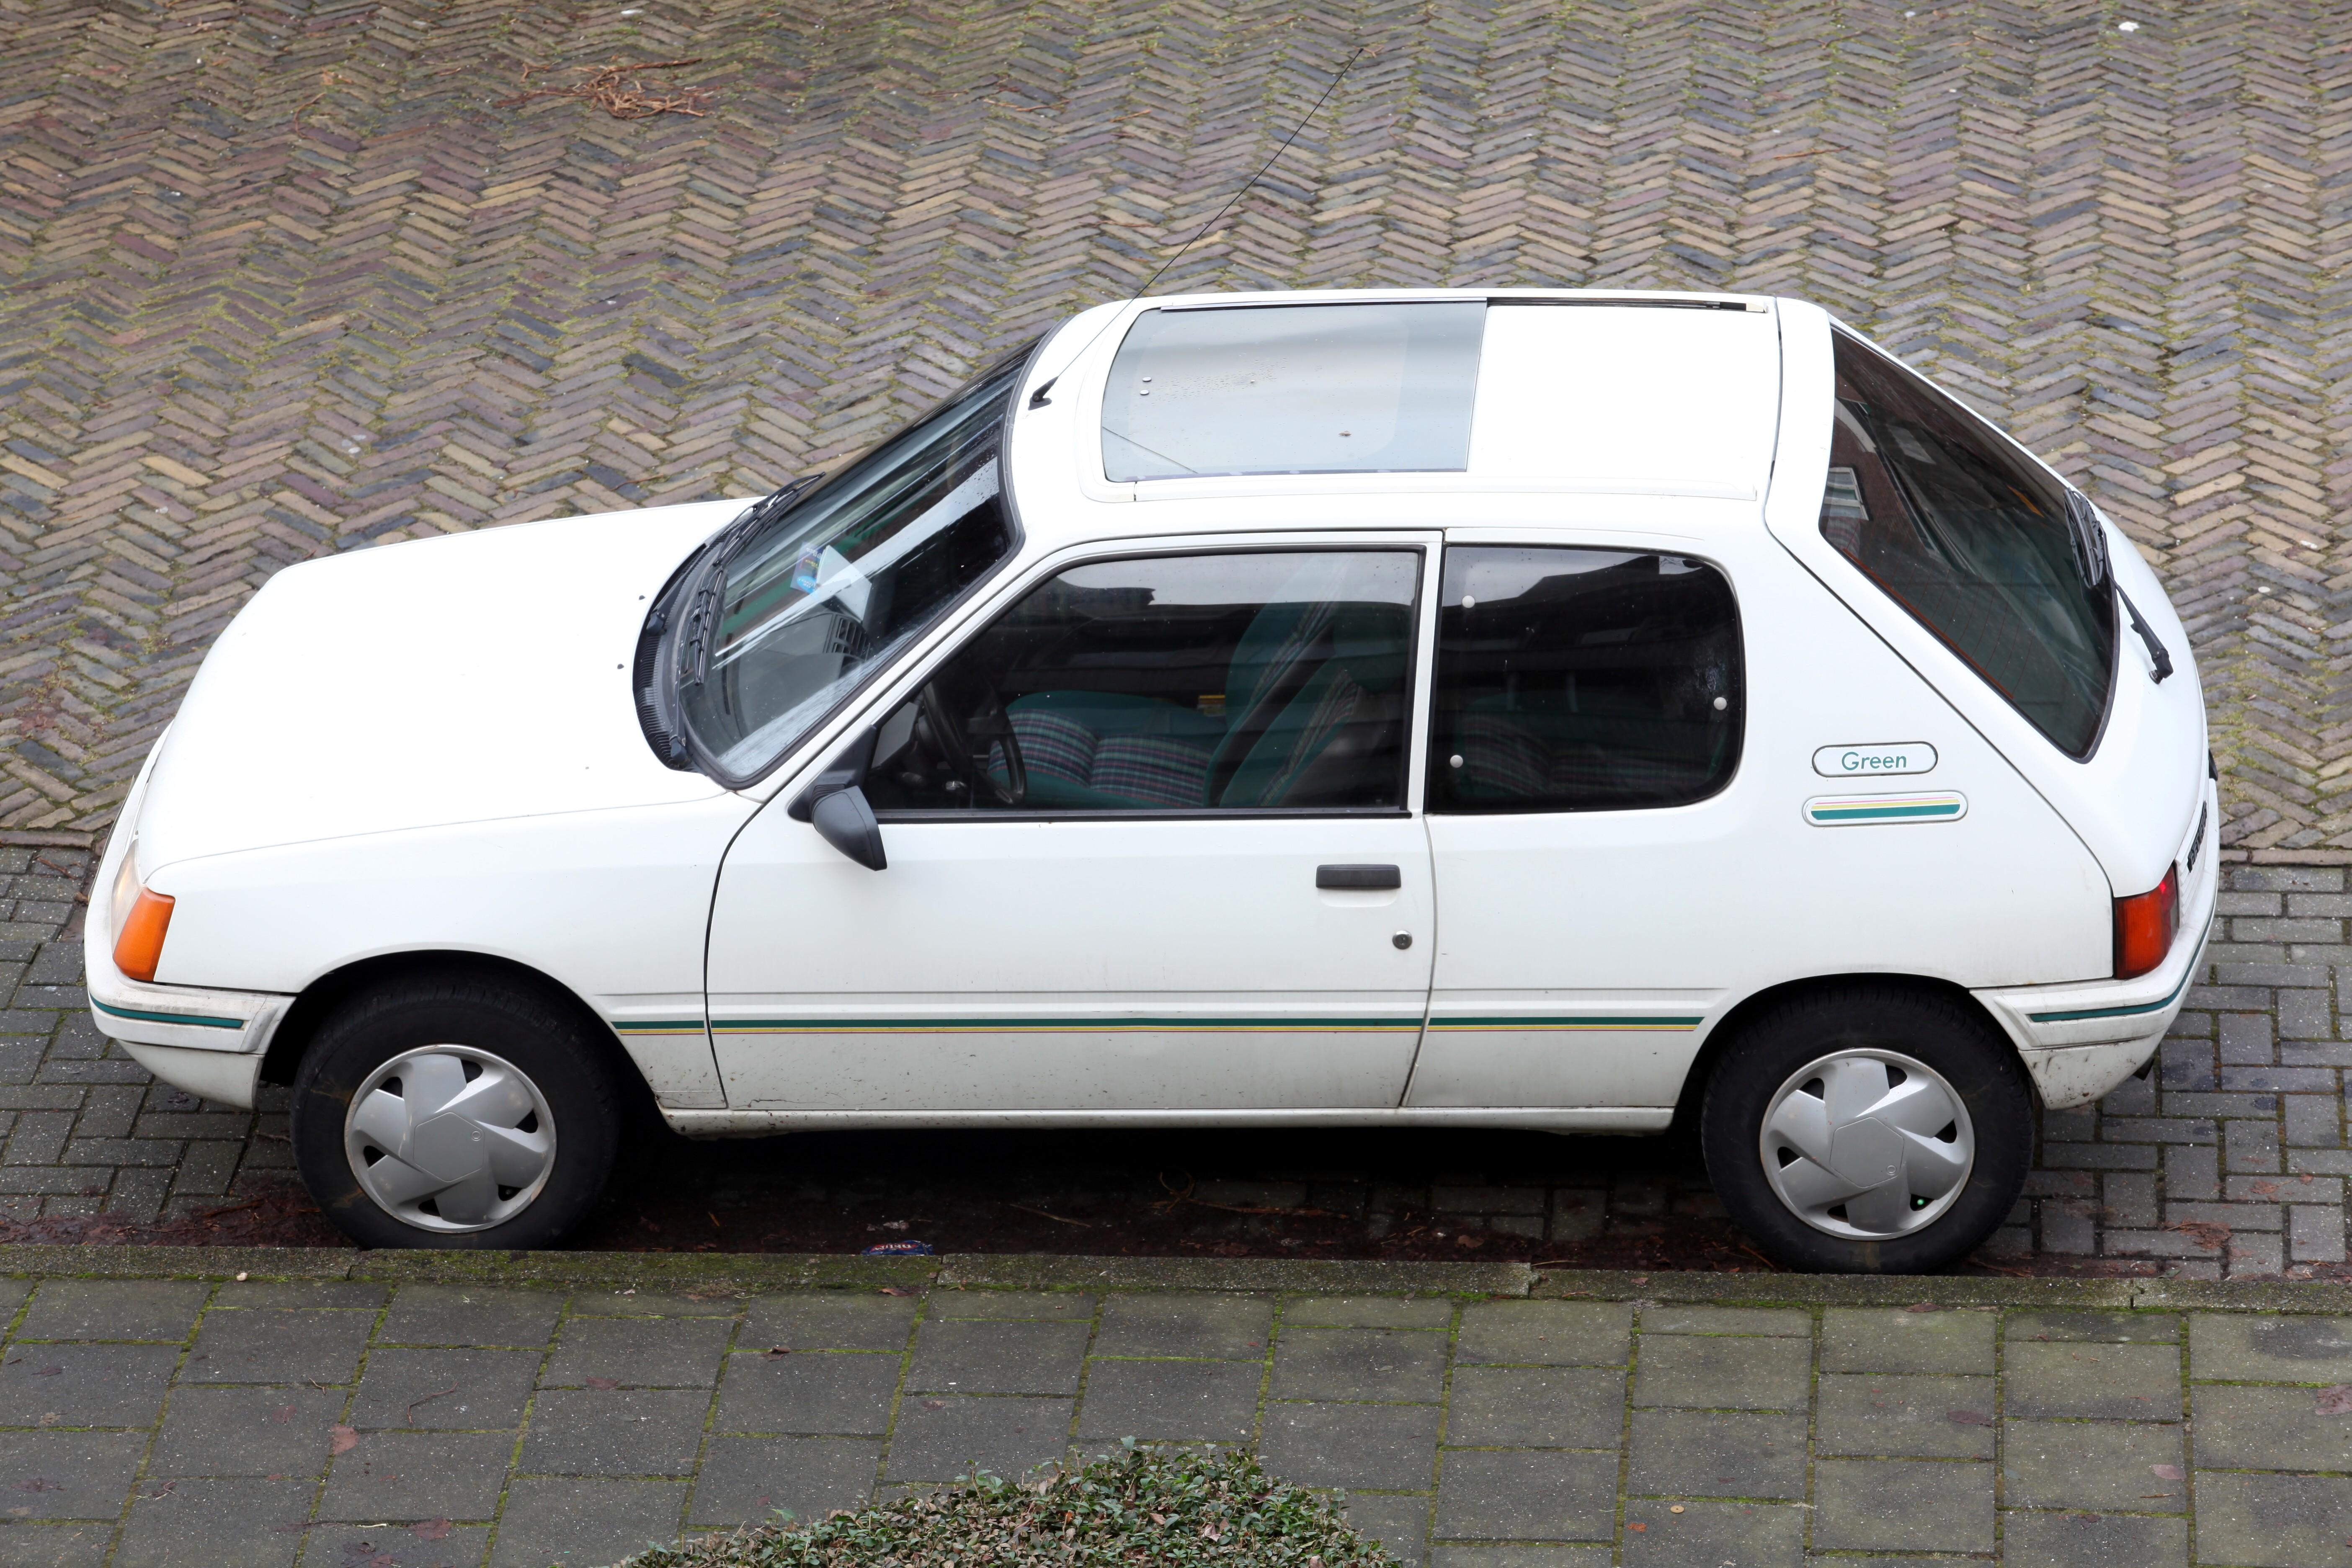 File Peugeot 205 Green Jpg Wikimedia Commons